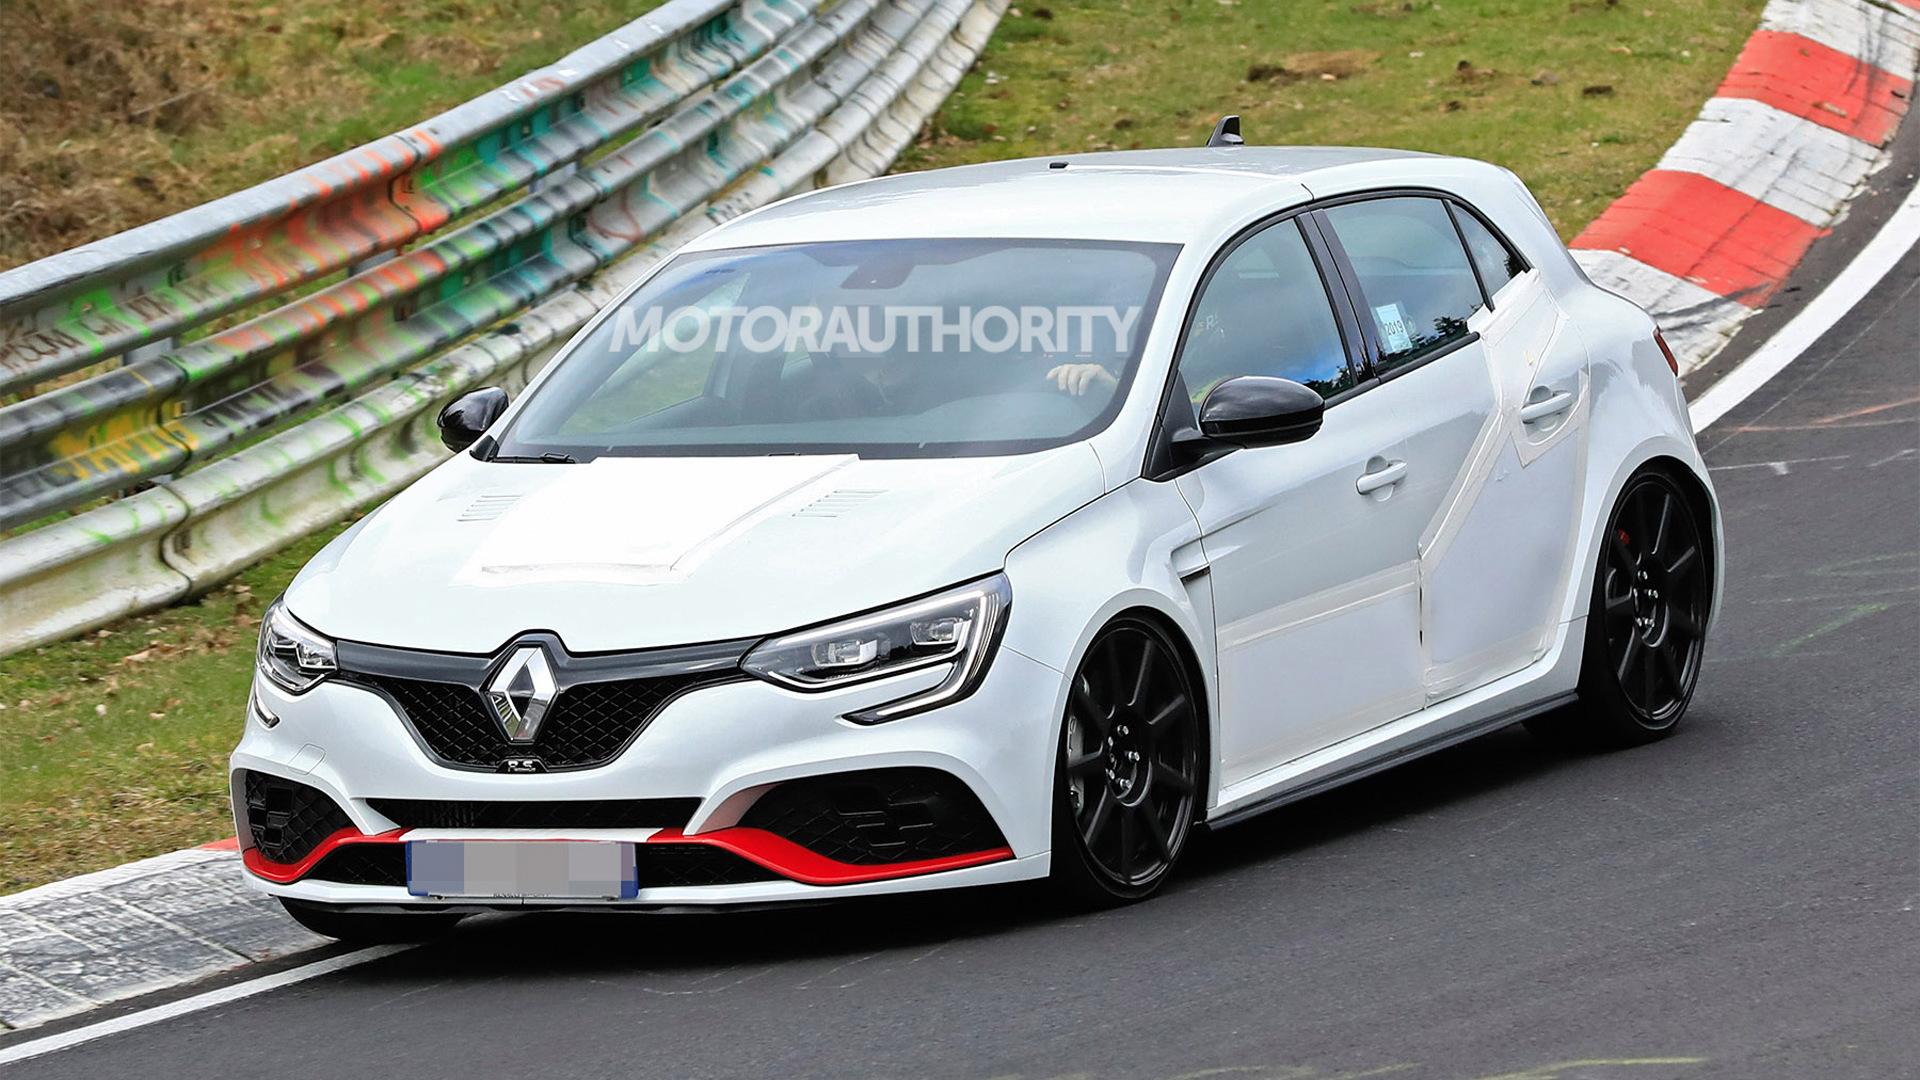 2020 Renault Megane RS Trophy R spy shots - Image via S. Baldauf/SB-Medien